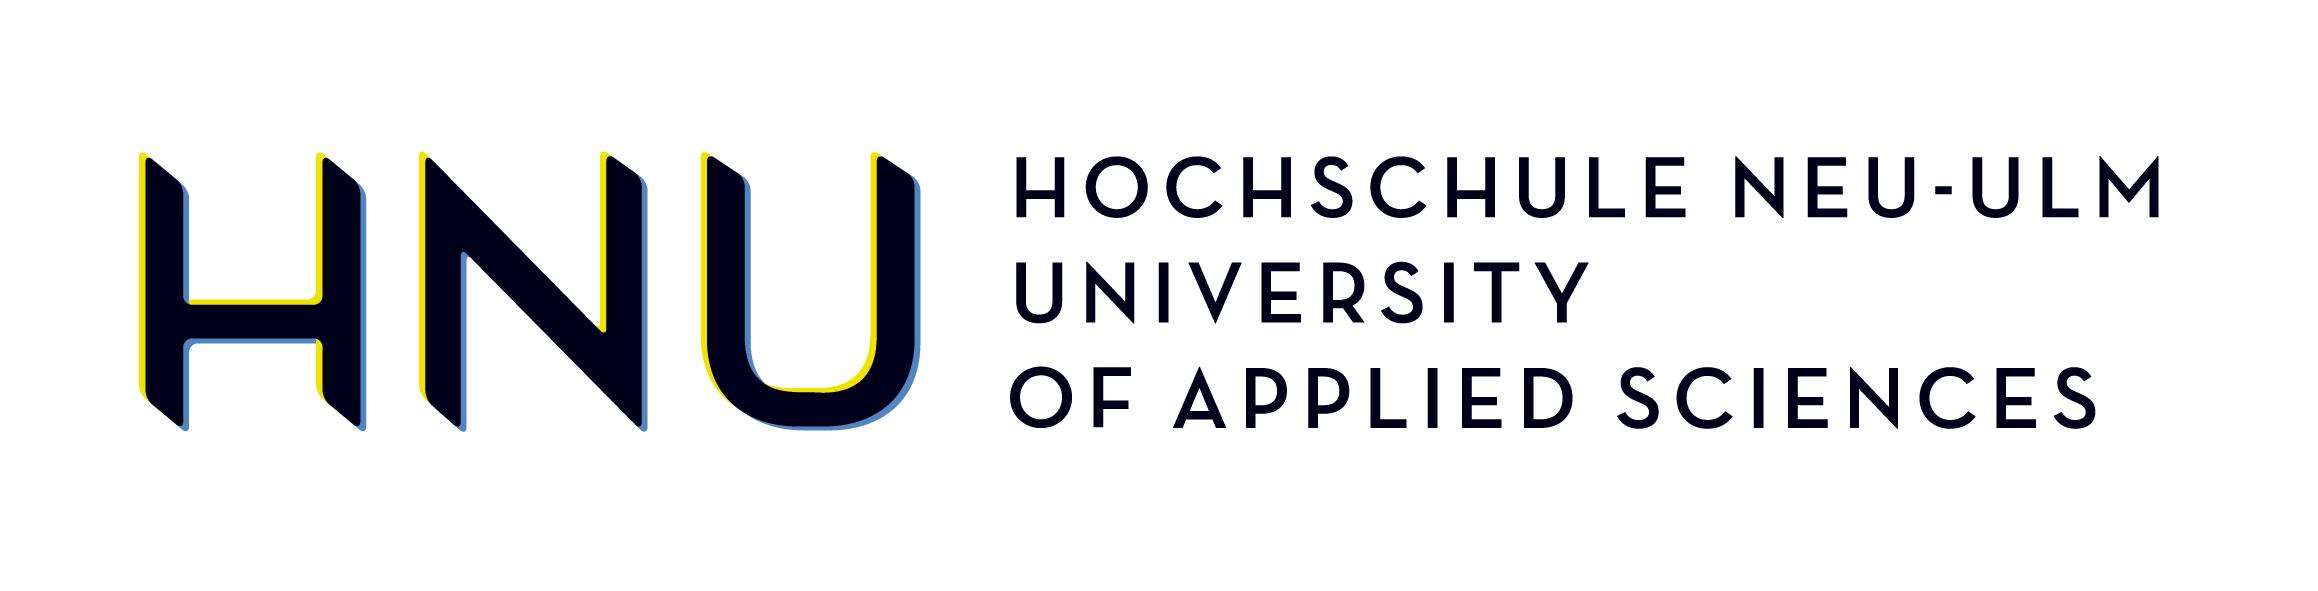 Hochschule Neu-Ulm